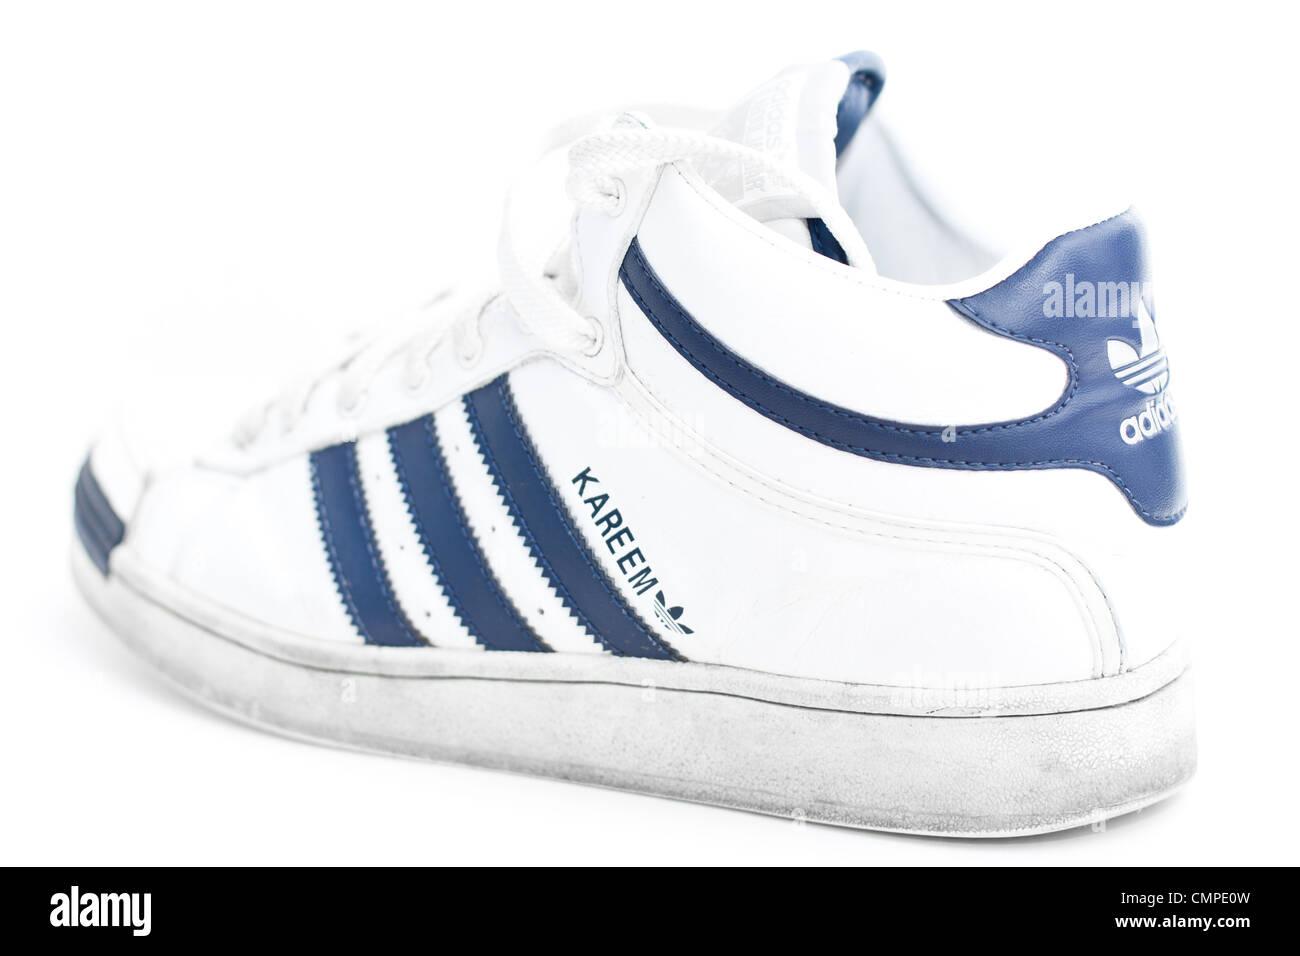 Originals Jabbar Kareem Chaussure Adidas Abdul Est aAwqWPqfBp